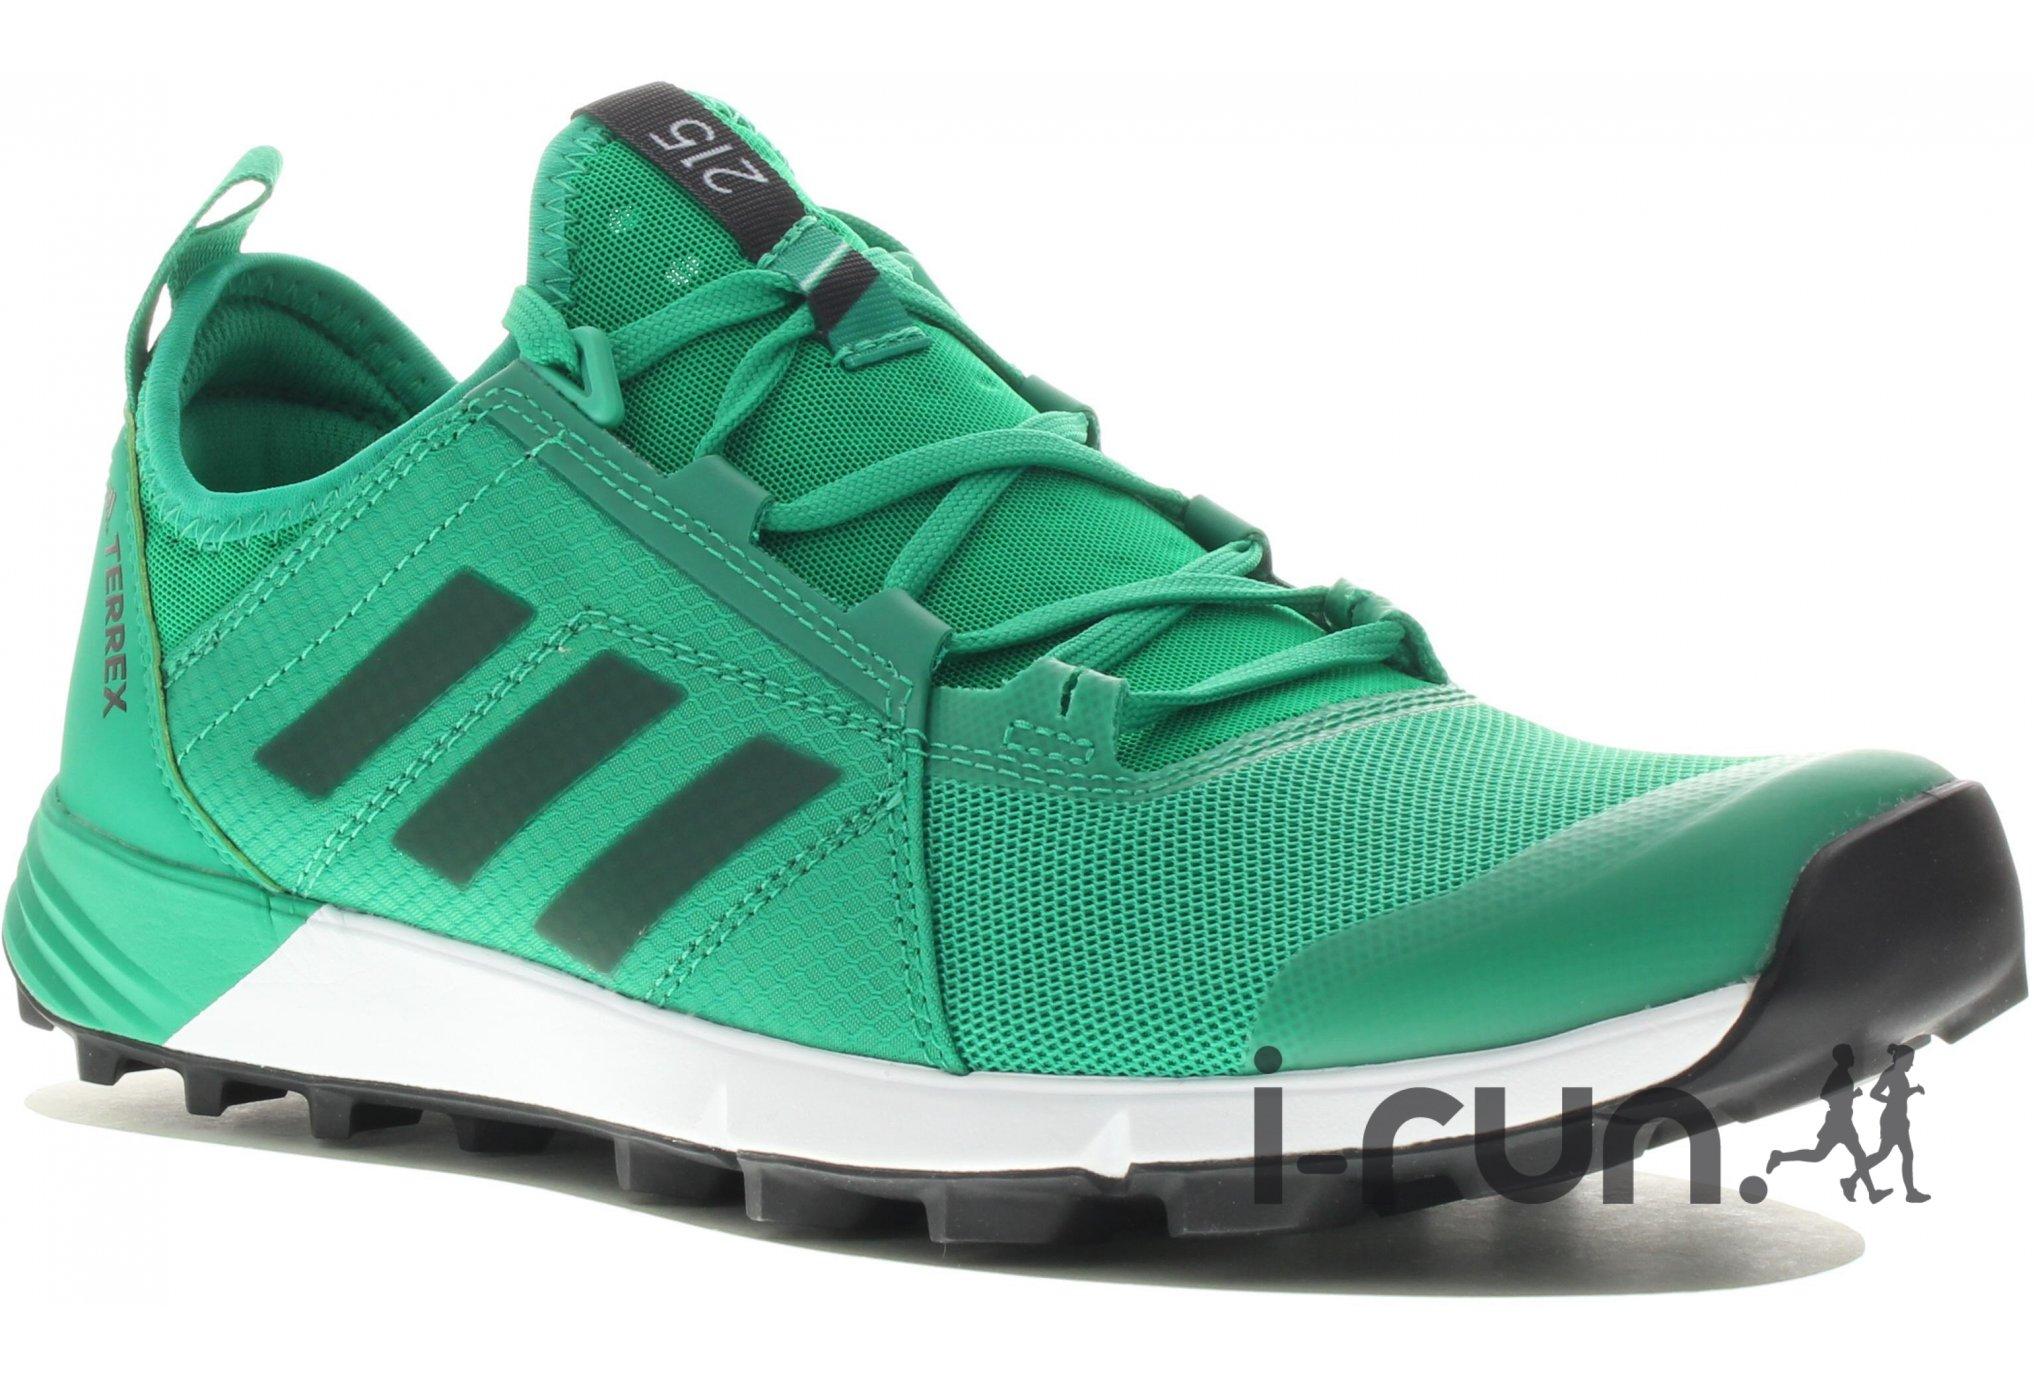 Course Terrex Adidas Lupeenne Chaussures Nature La Agravic W Speed srdxBQothC